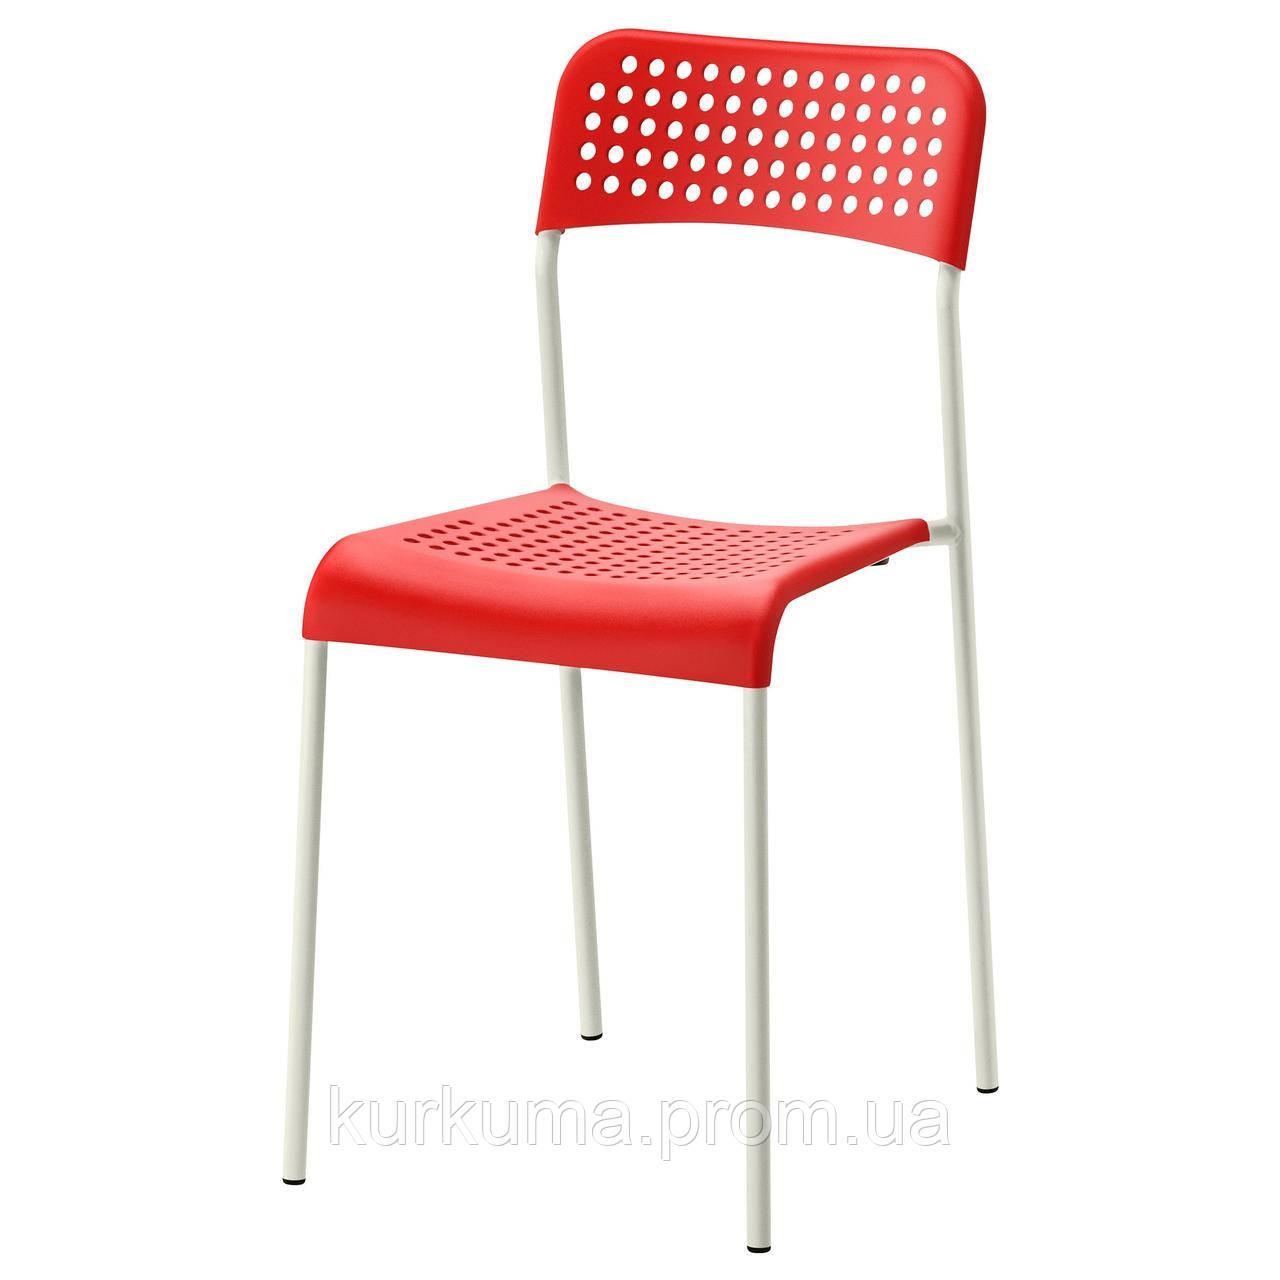 IKEA ADDE Стул, красный, белый  (902.191.84)